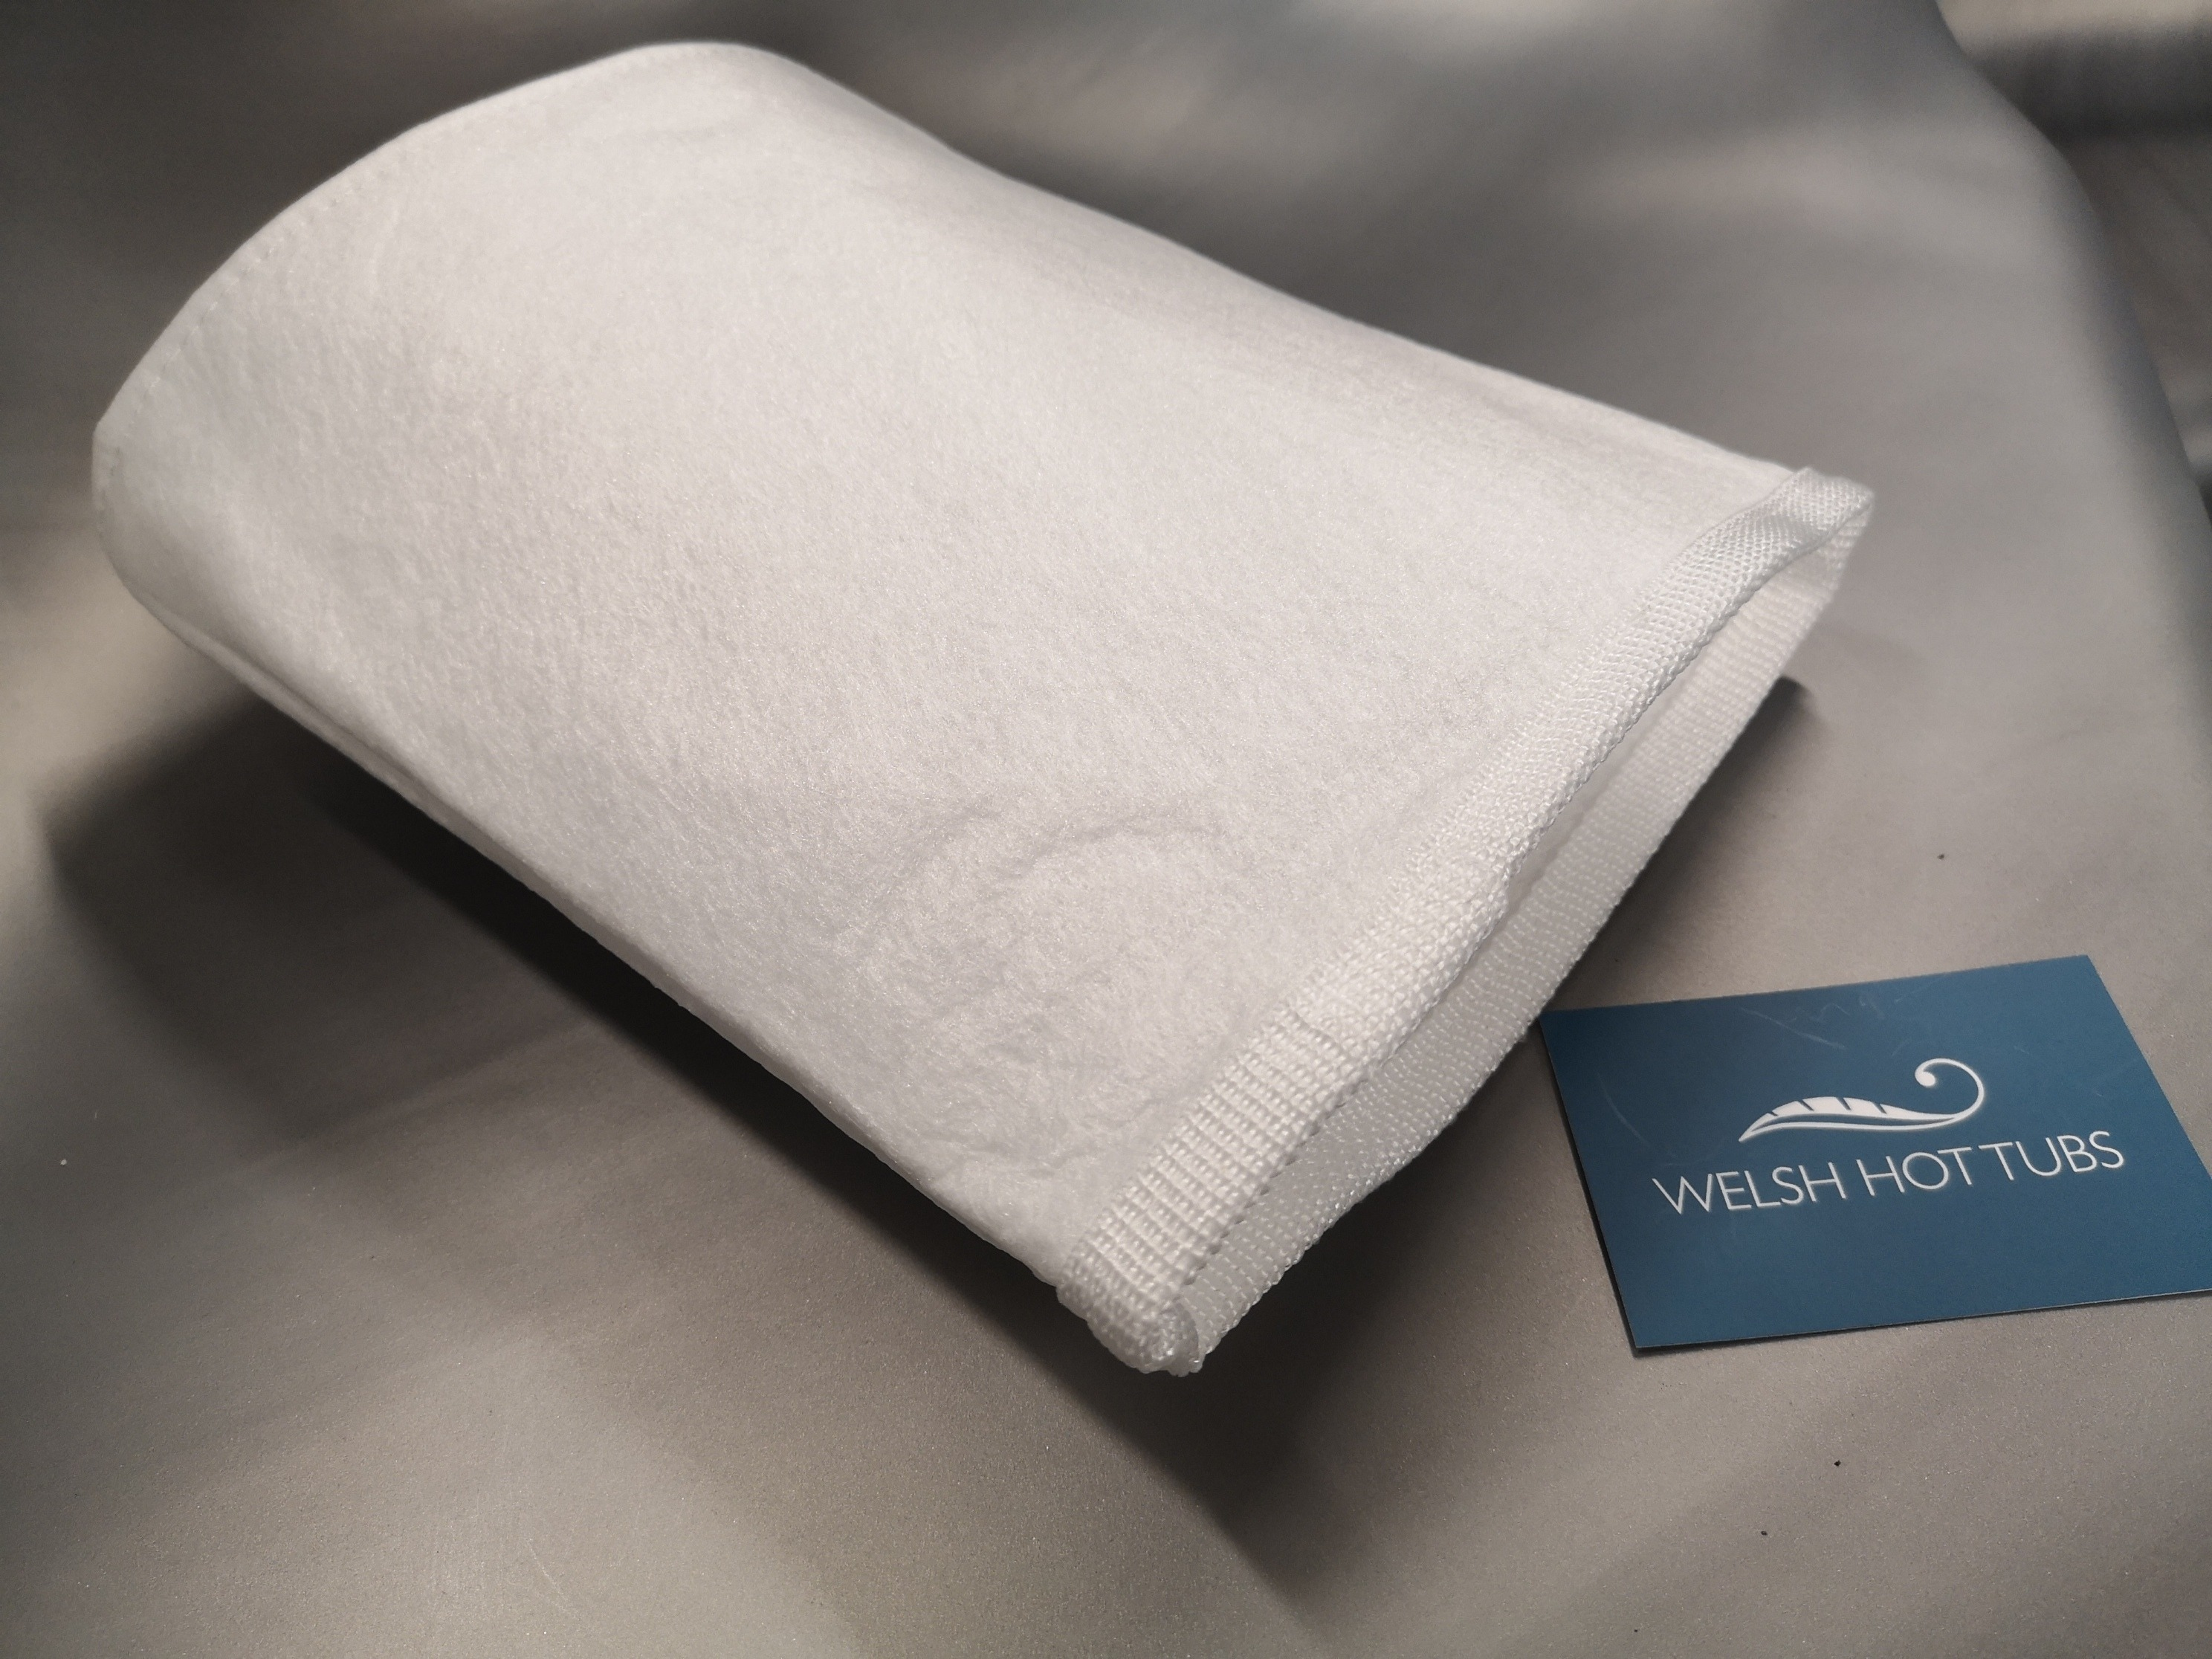 Hot Tub Supplies Near Me | Hot Tub Accessories | Hot Tubs for Sale